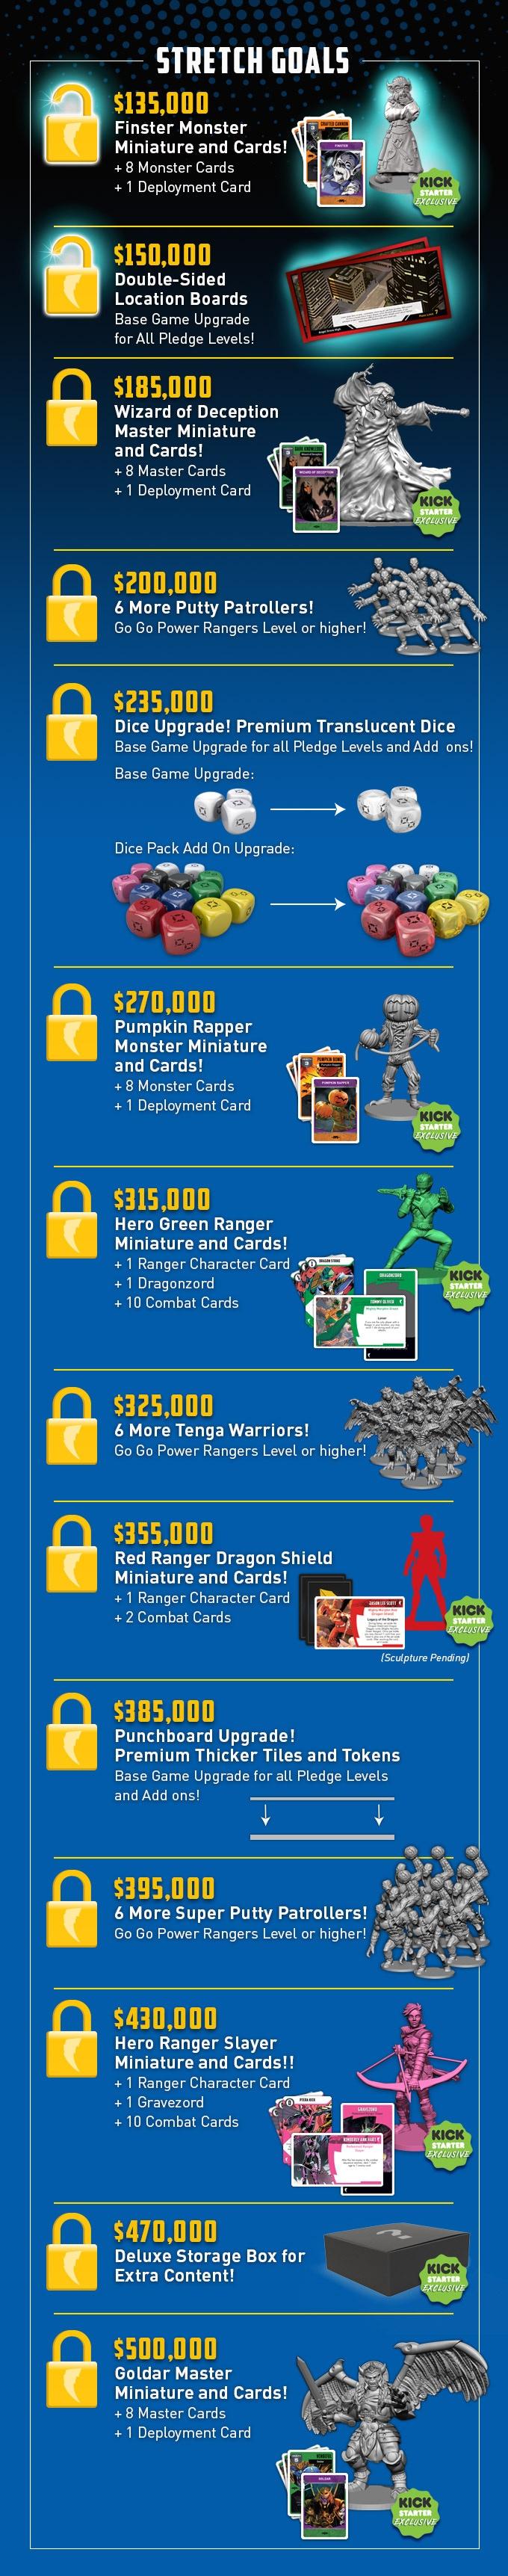 Power Rangers_Heroes of the Grid_kickstarter goals_base set (1)